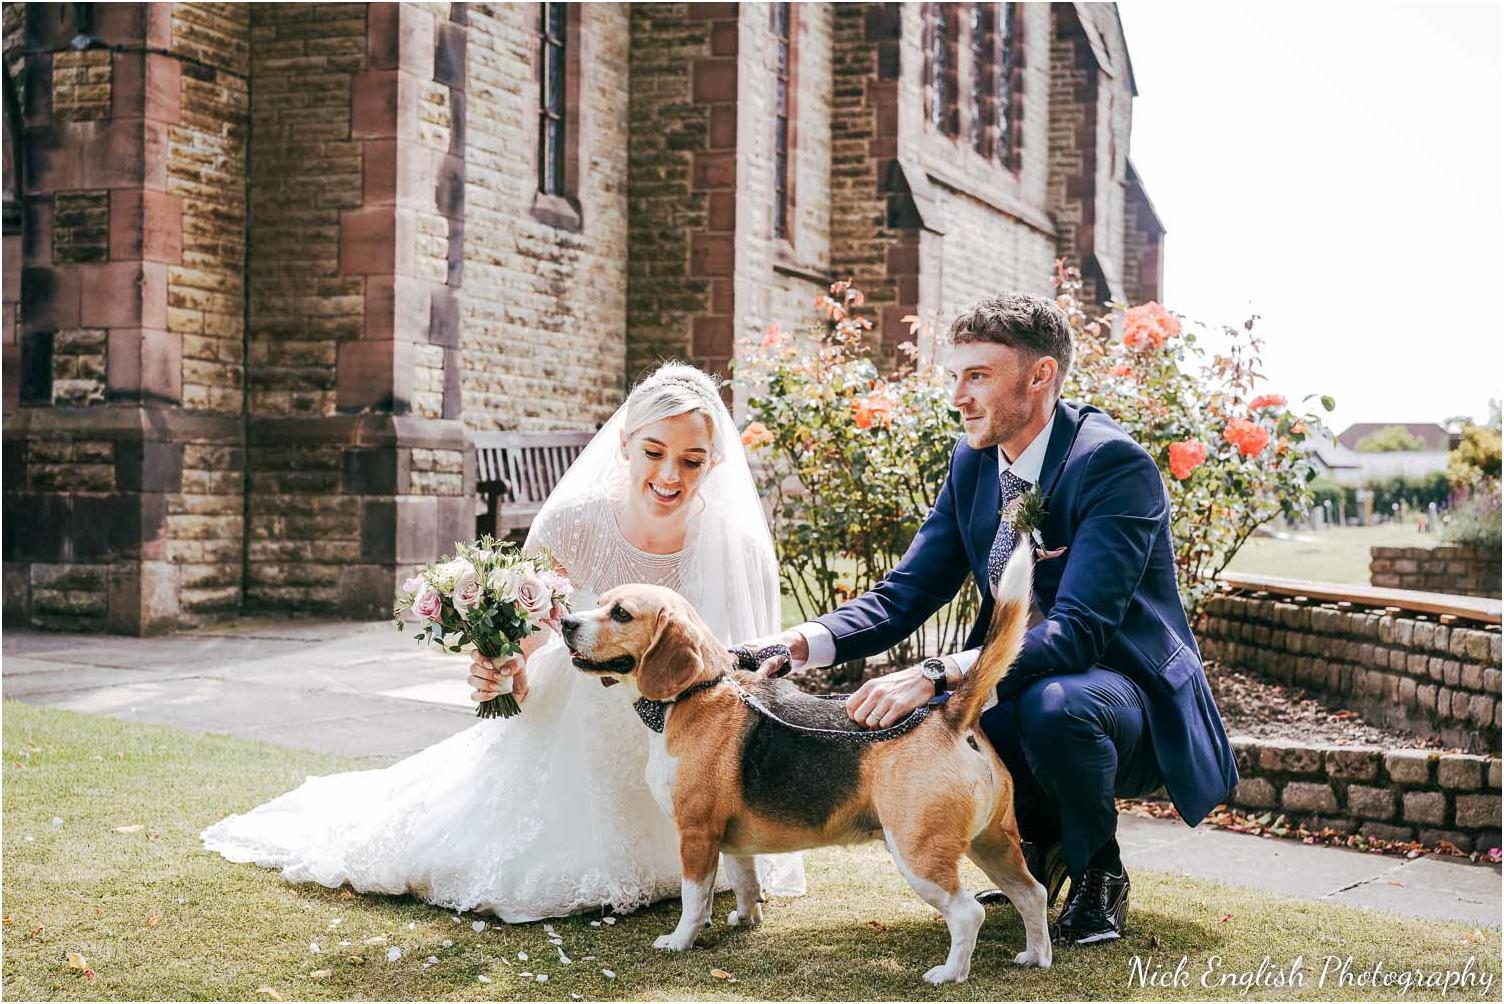 Mitton_Hall_Wedding_Photograph-59.jpg